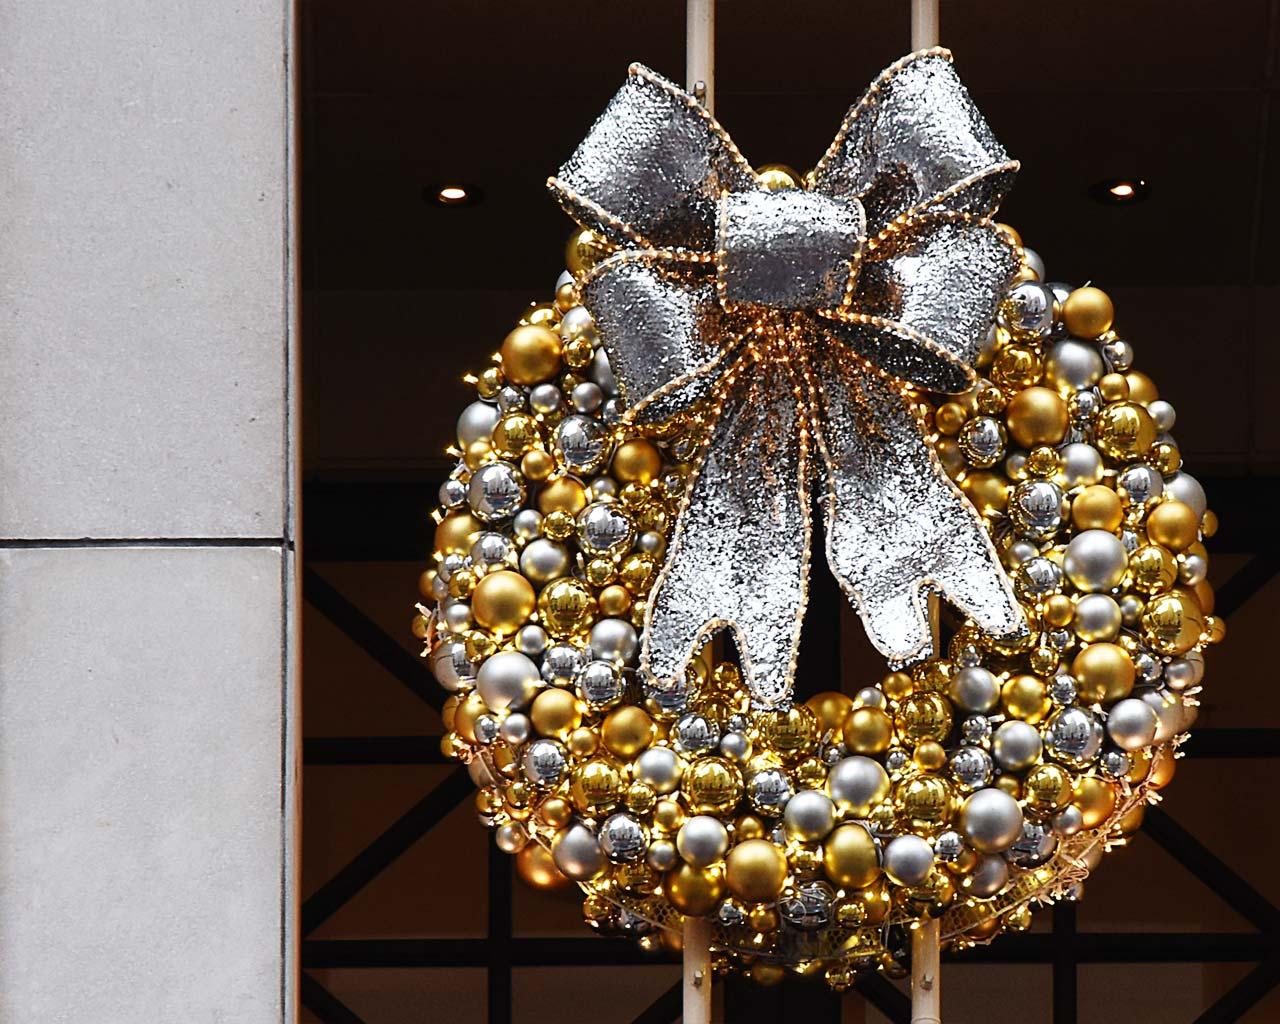 NY Tommy Hilfinger Decorations